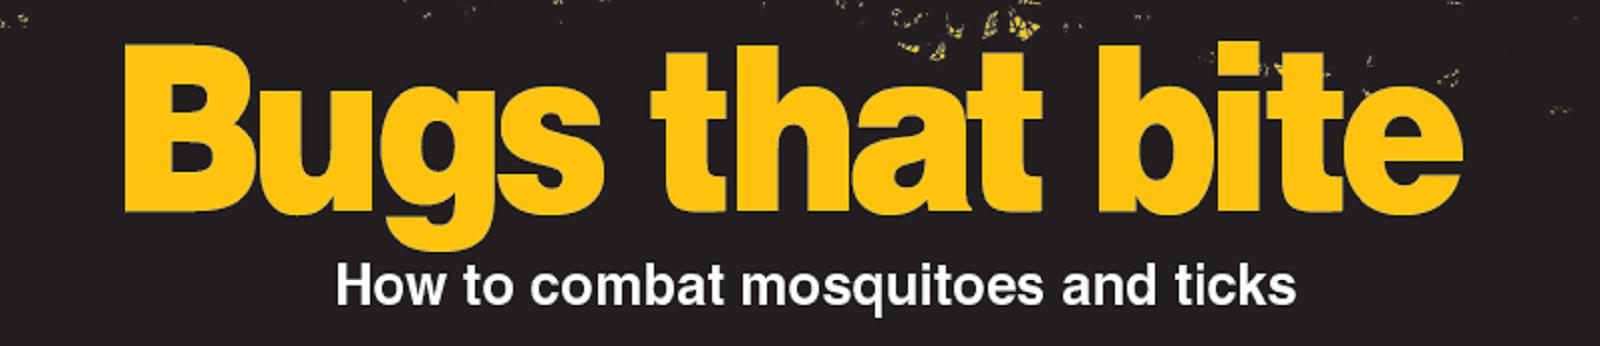 bugs that bite banner2